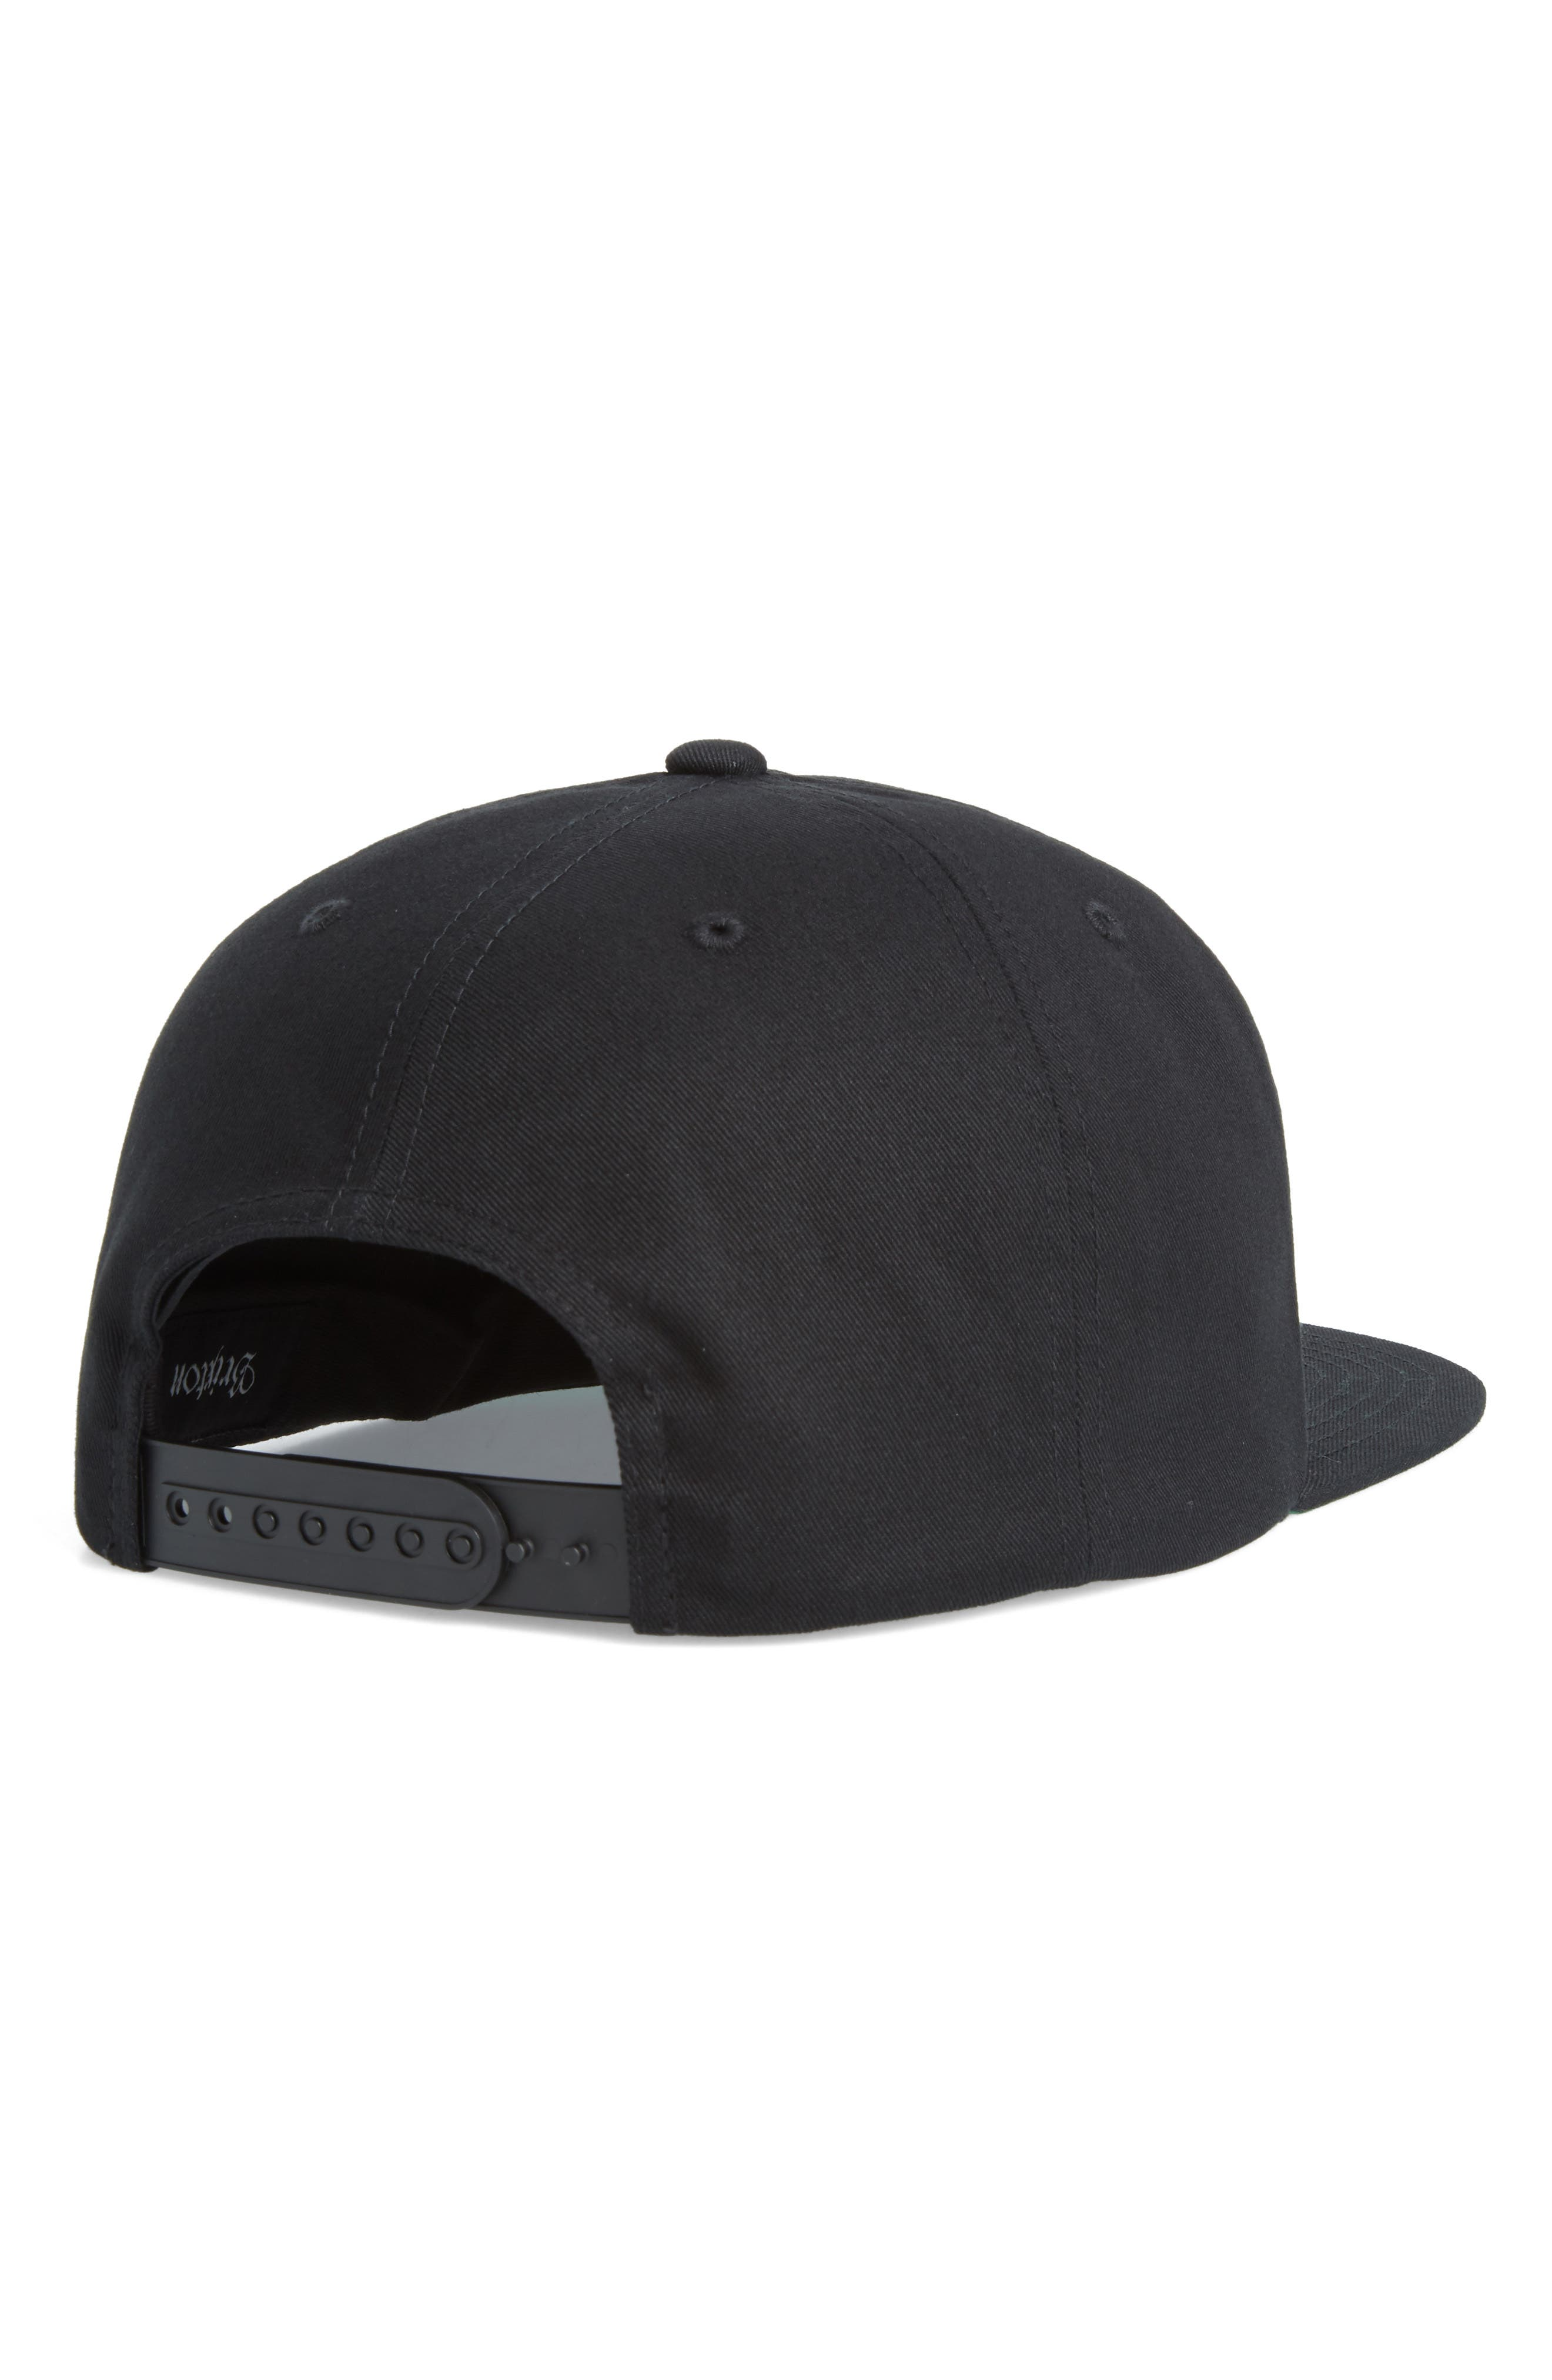 Garth Flat Brimmed Cap,                             Alternate thumbnail 2, color,                             BLACK/ WHITE